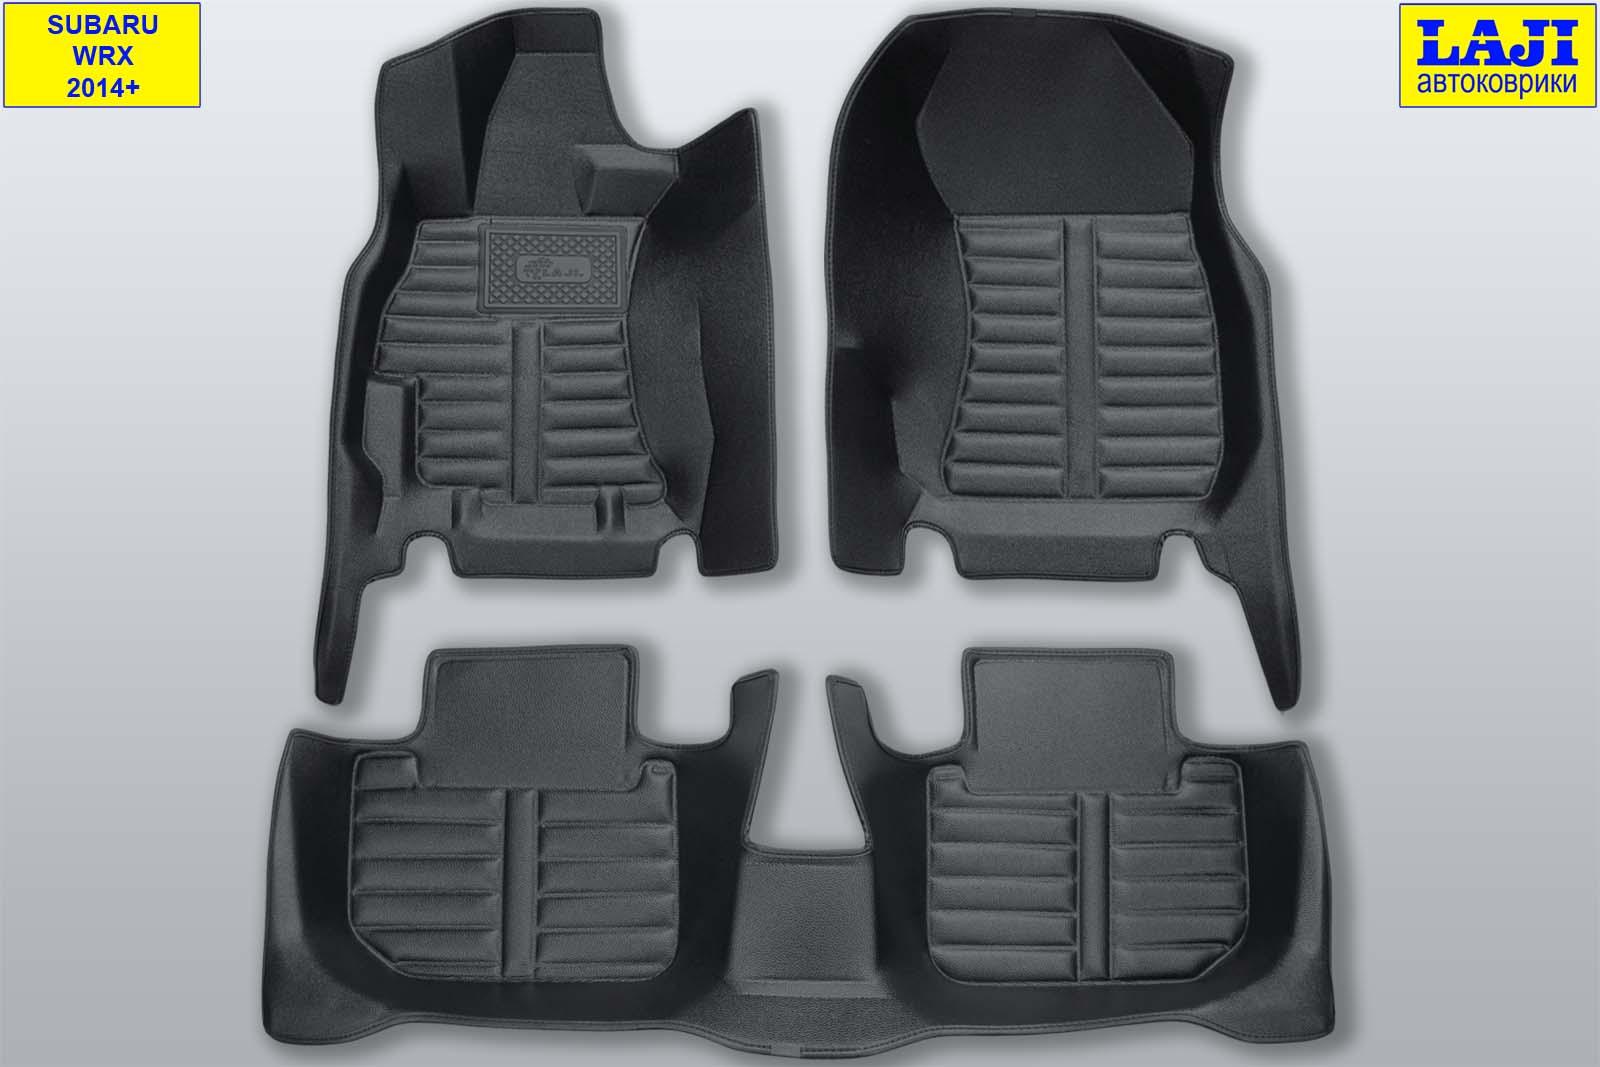 5D коврики в салон Subaru WRX 2014-н.в. 1